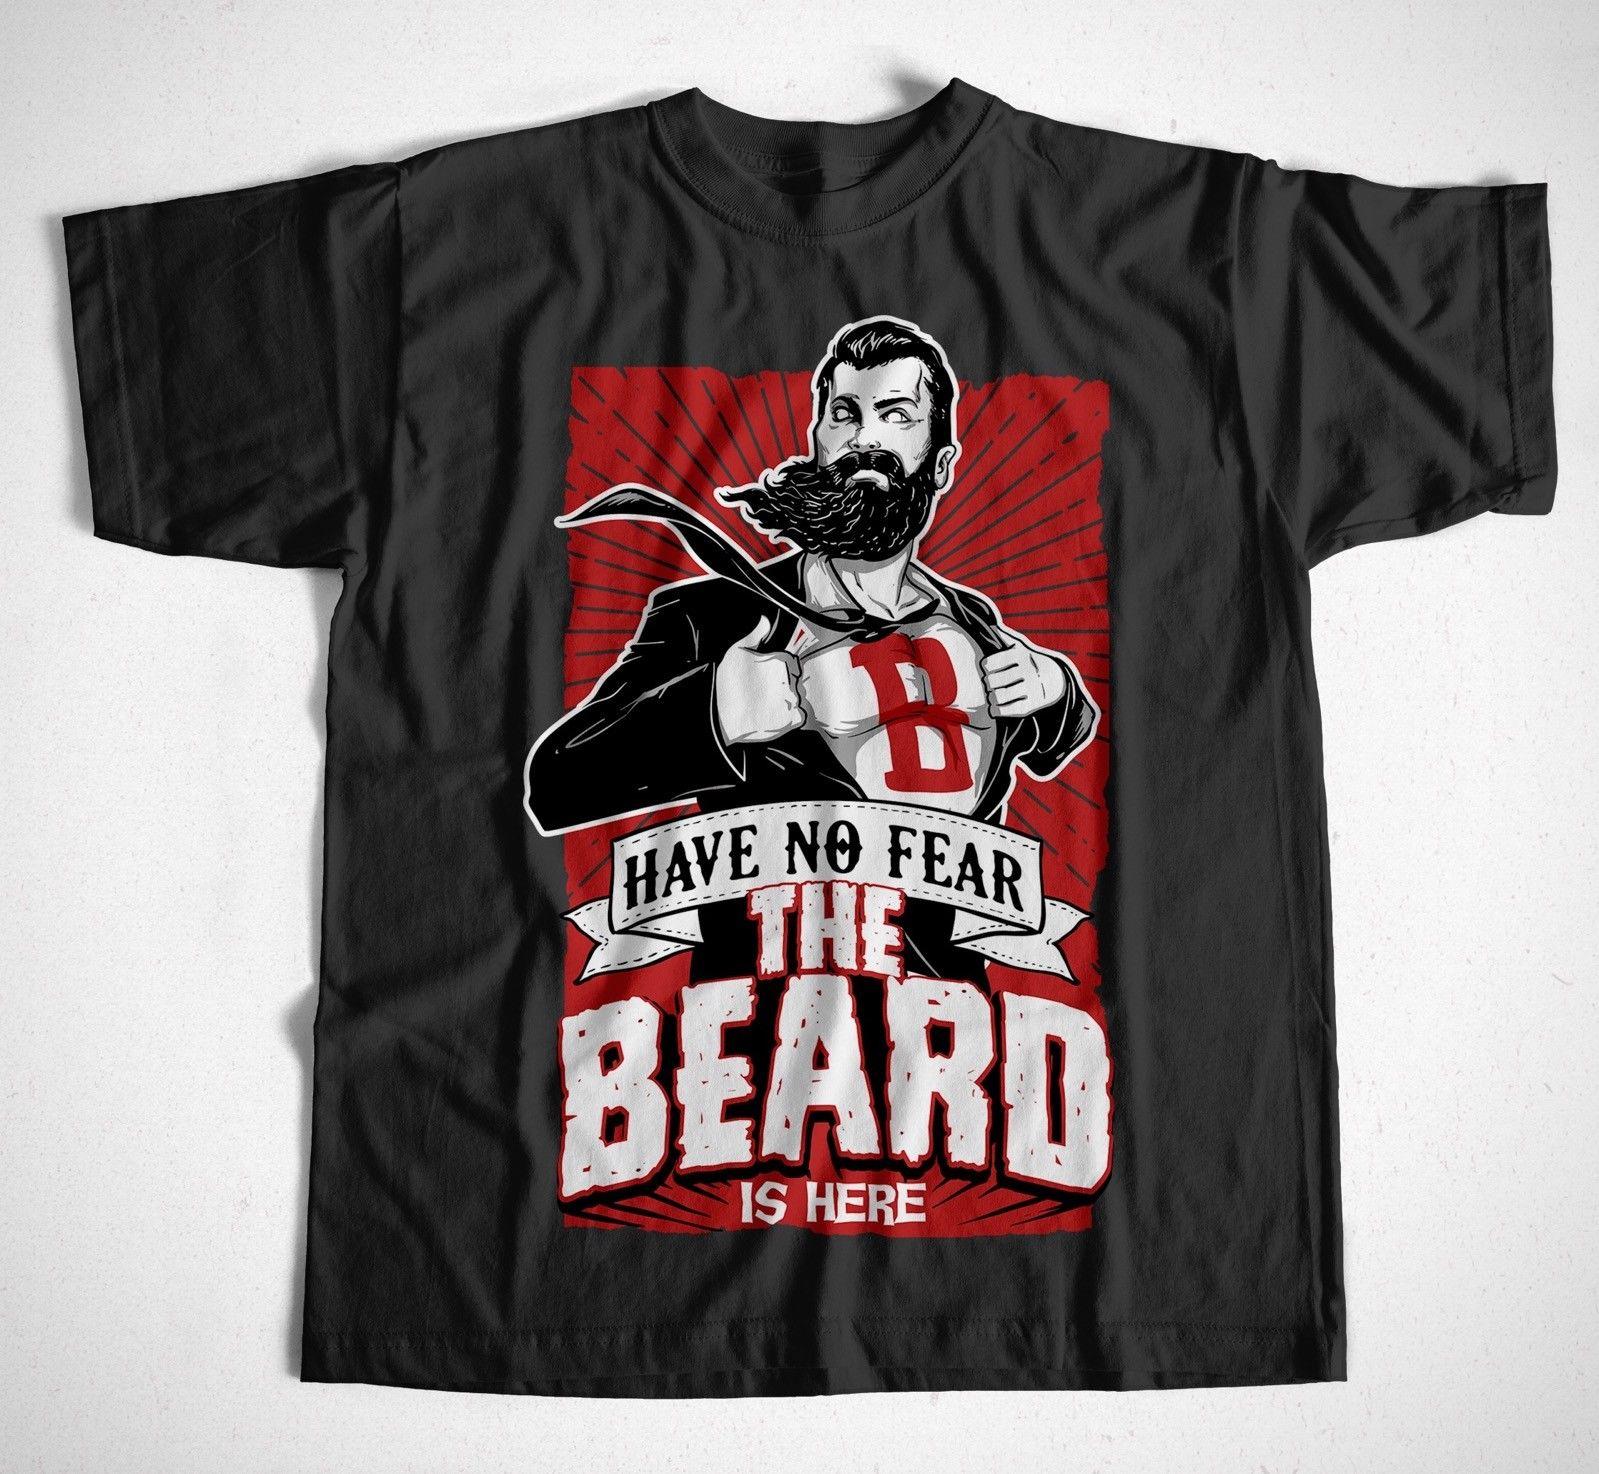 T-Shirt The Beard is Here Bart Friseur Ombre Sombrero Barber Barbier Shop Harajuku Pokemon Shirt Top Tee